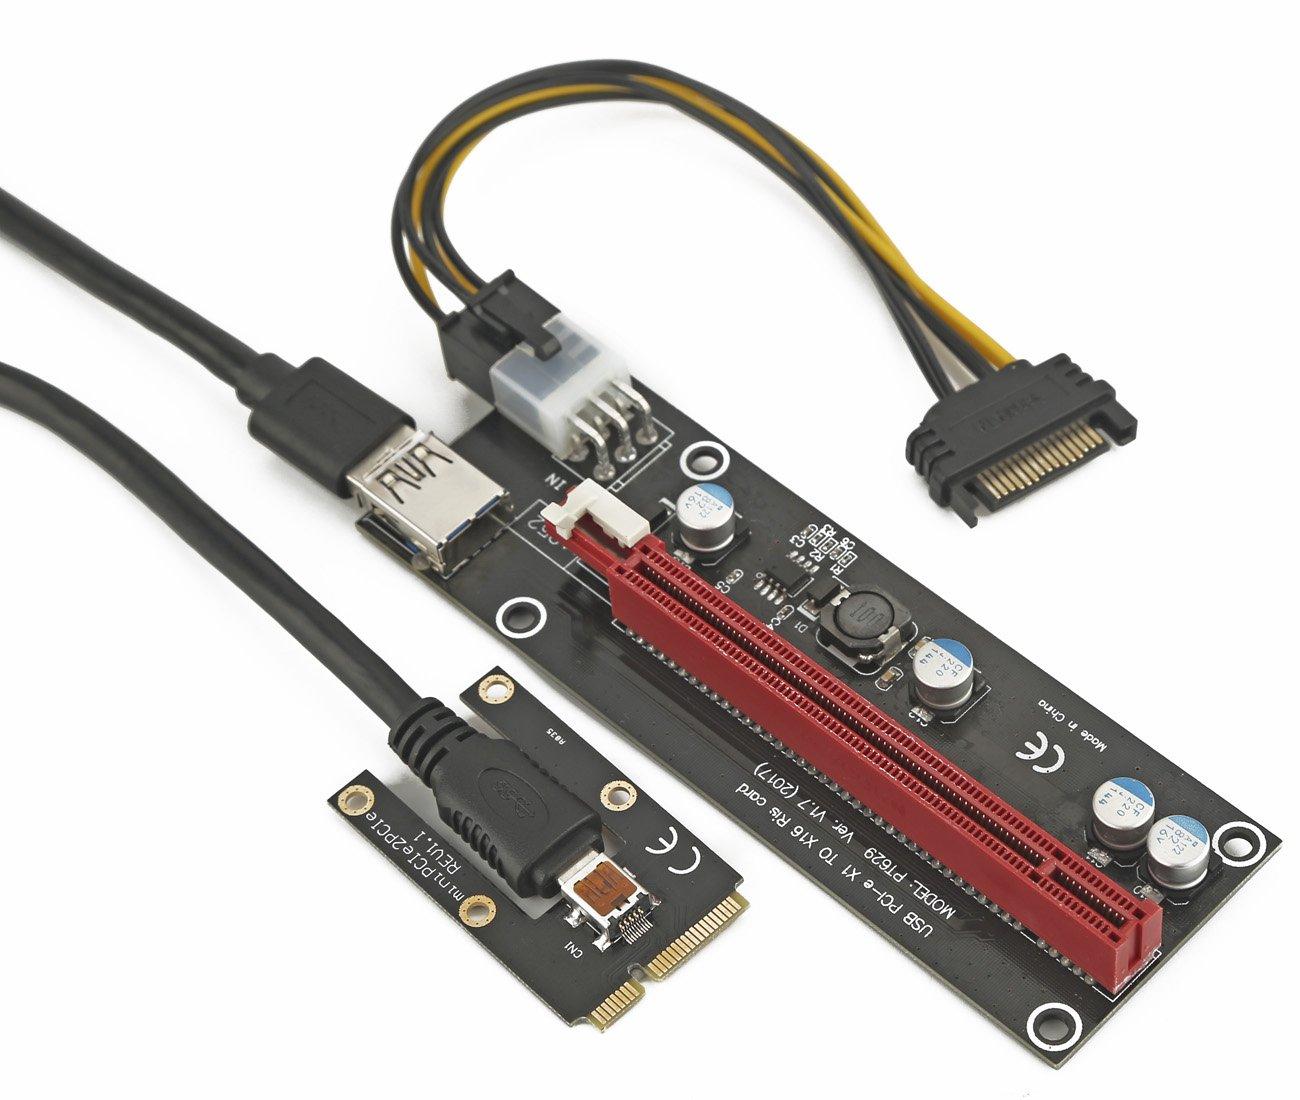 Amazon.com: Graphics Card Plus to Laptop | miniPCI e to X16 ...